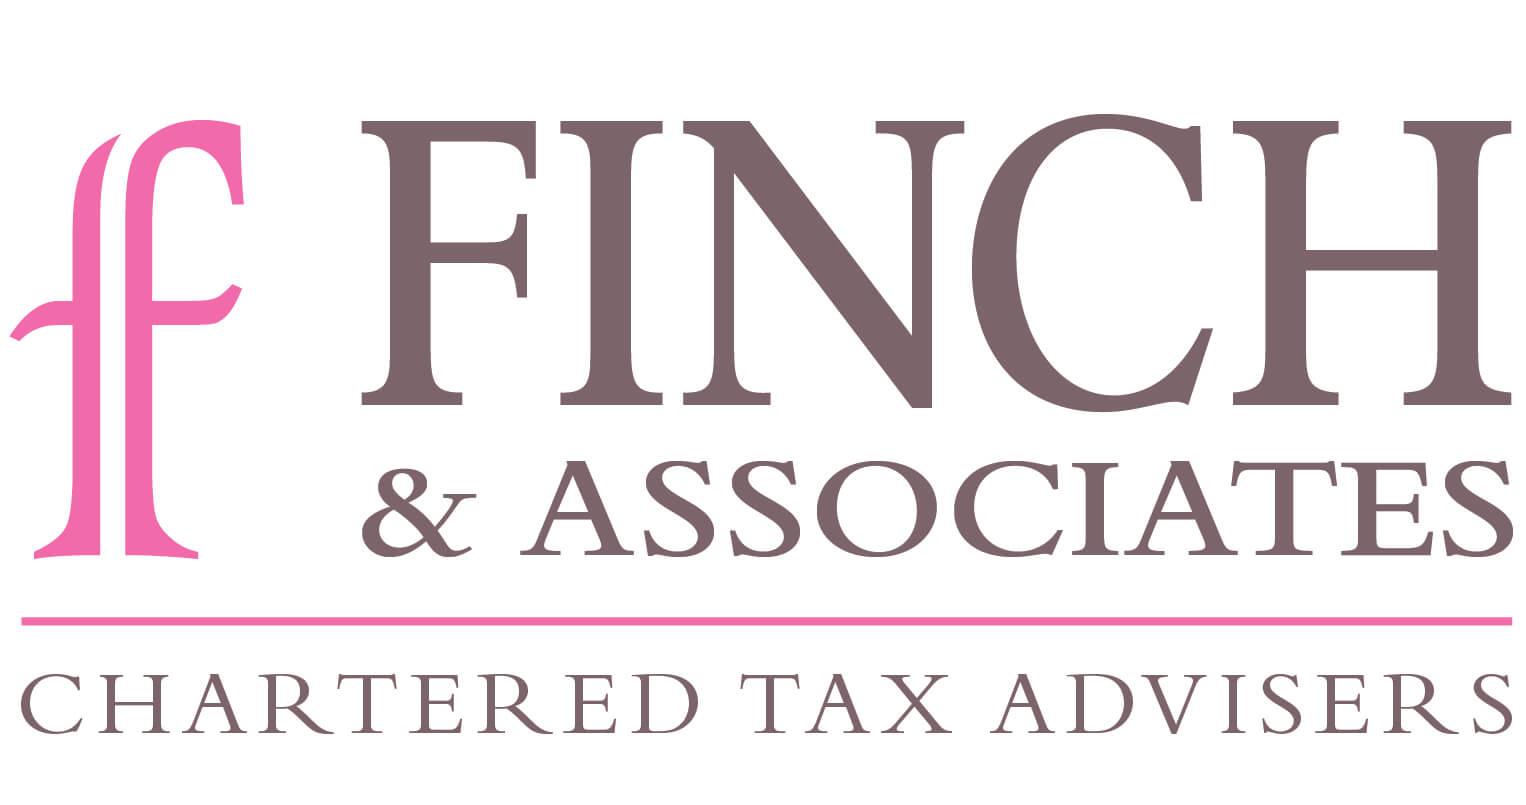 Finch & Associates - US Tax Returns in the UK